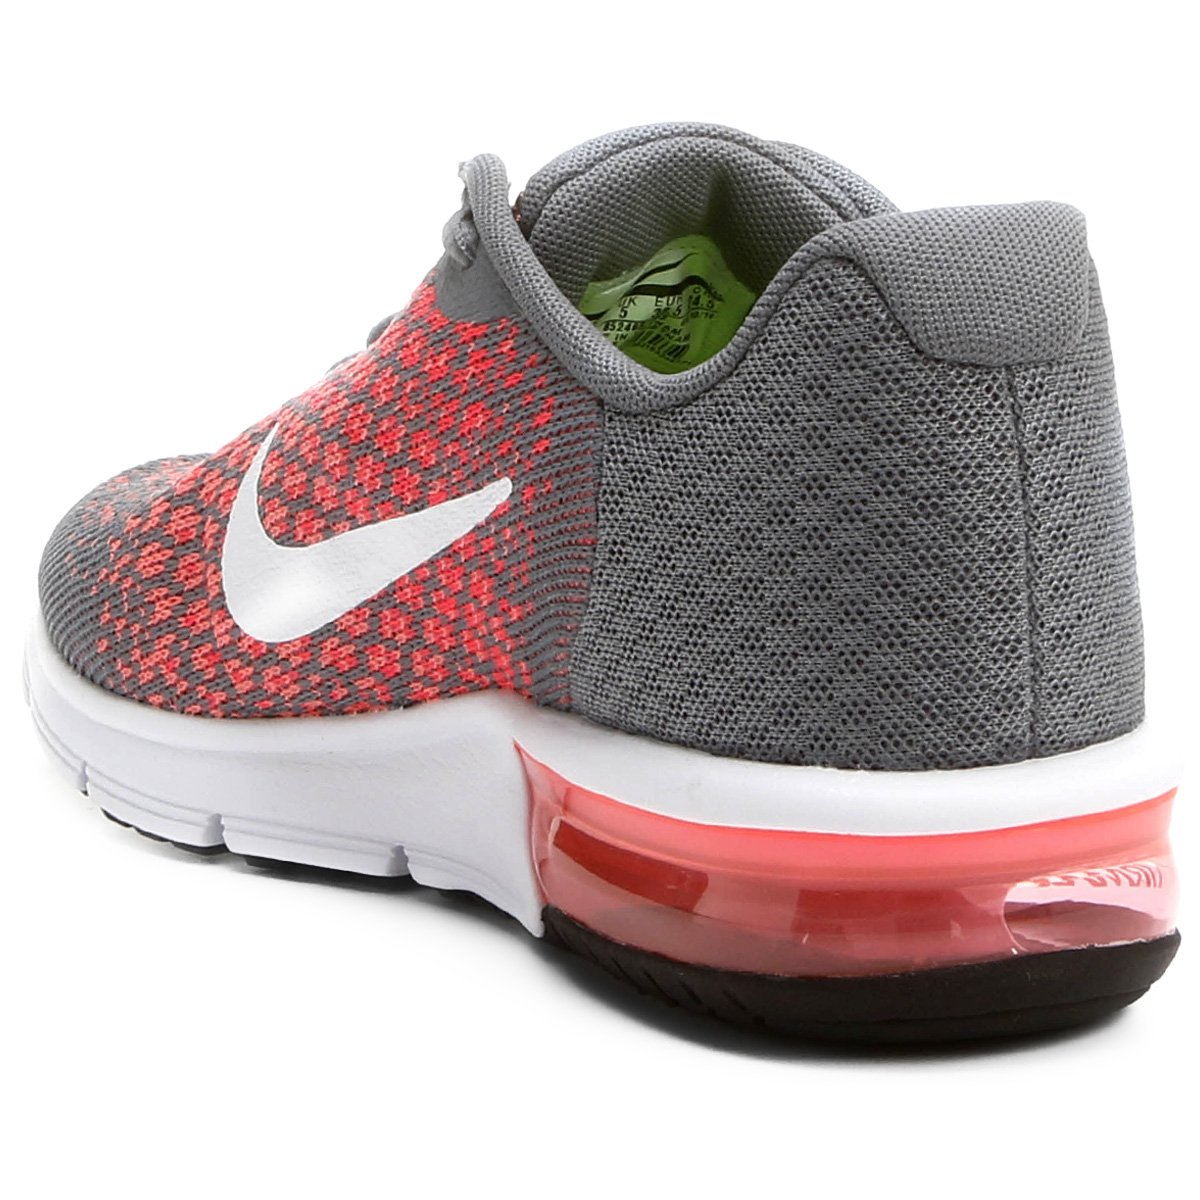 T 234 Nis Nike Air Max Sequent 2 Feminino Cinza E Vermelho